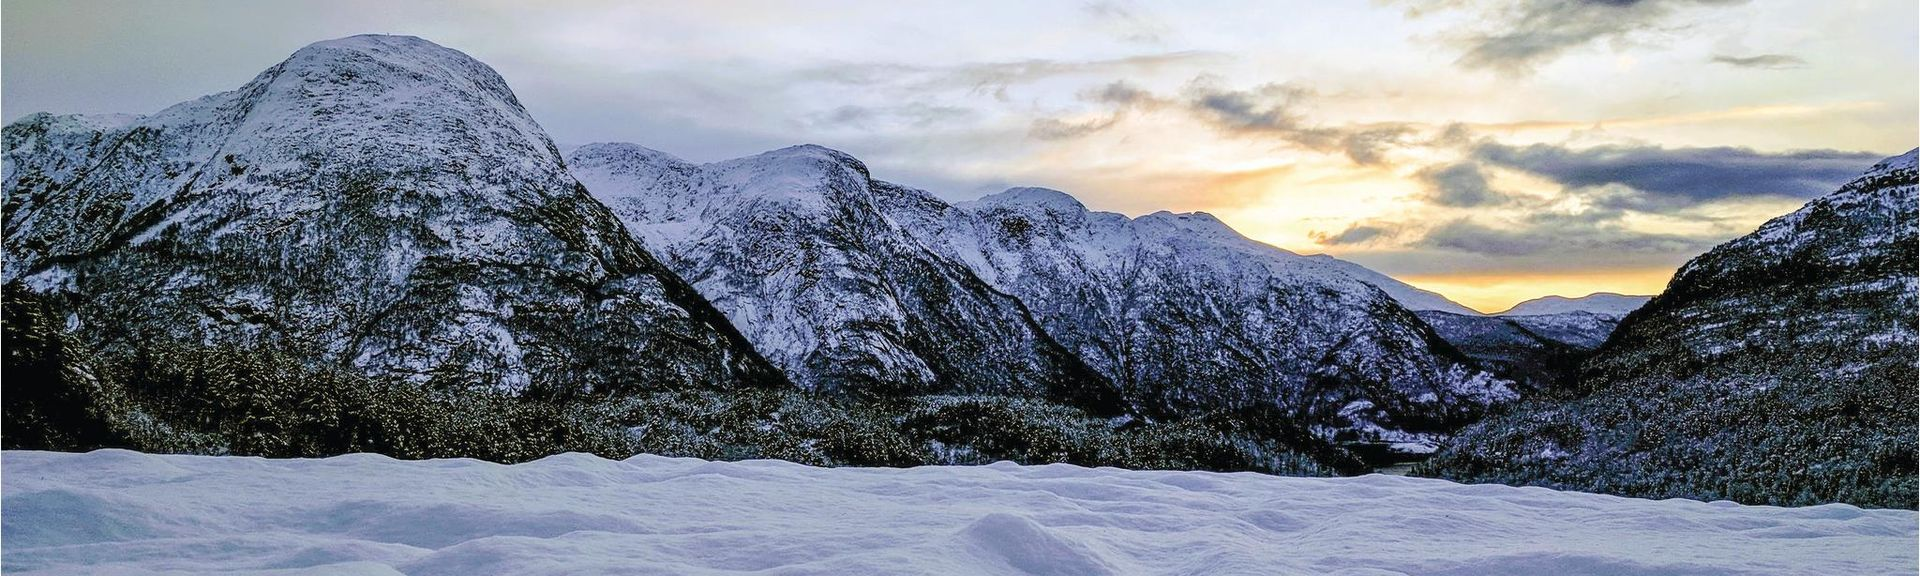 Jondal, Norway